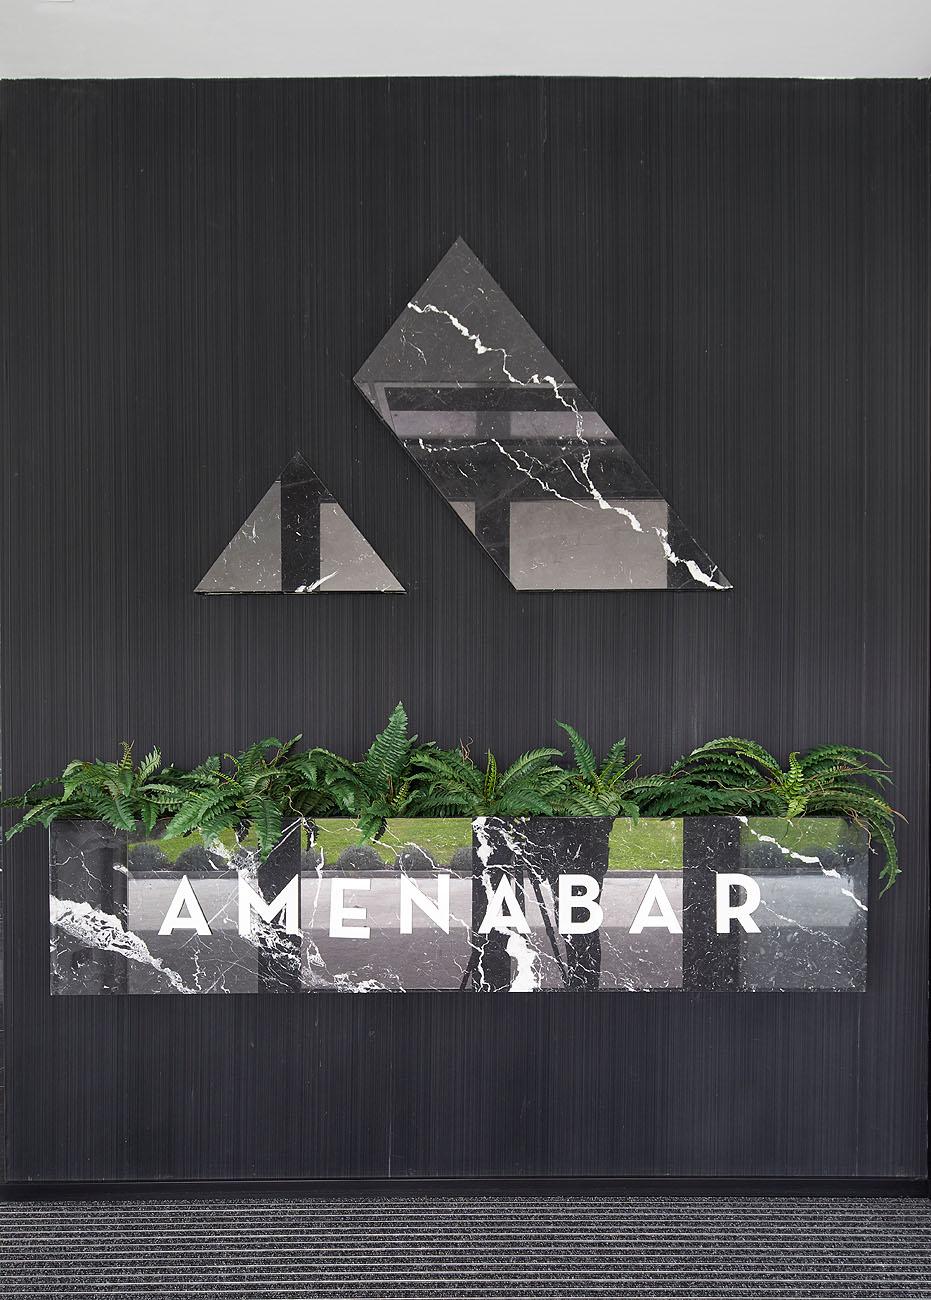 Oficinas de Amenabar en Miramón - Iñaki Caperochipi - Fotografía